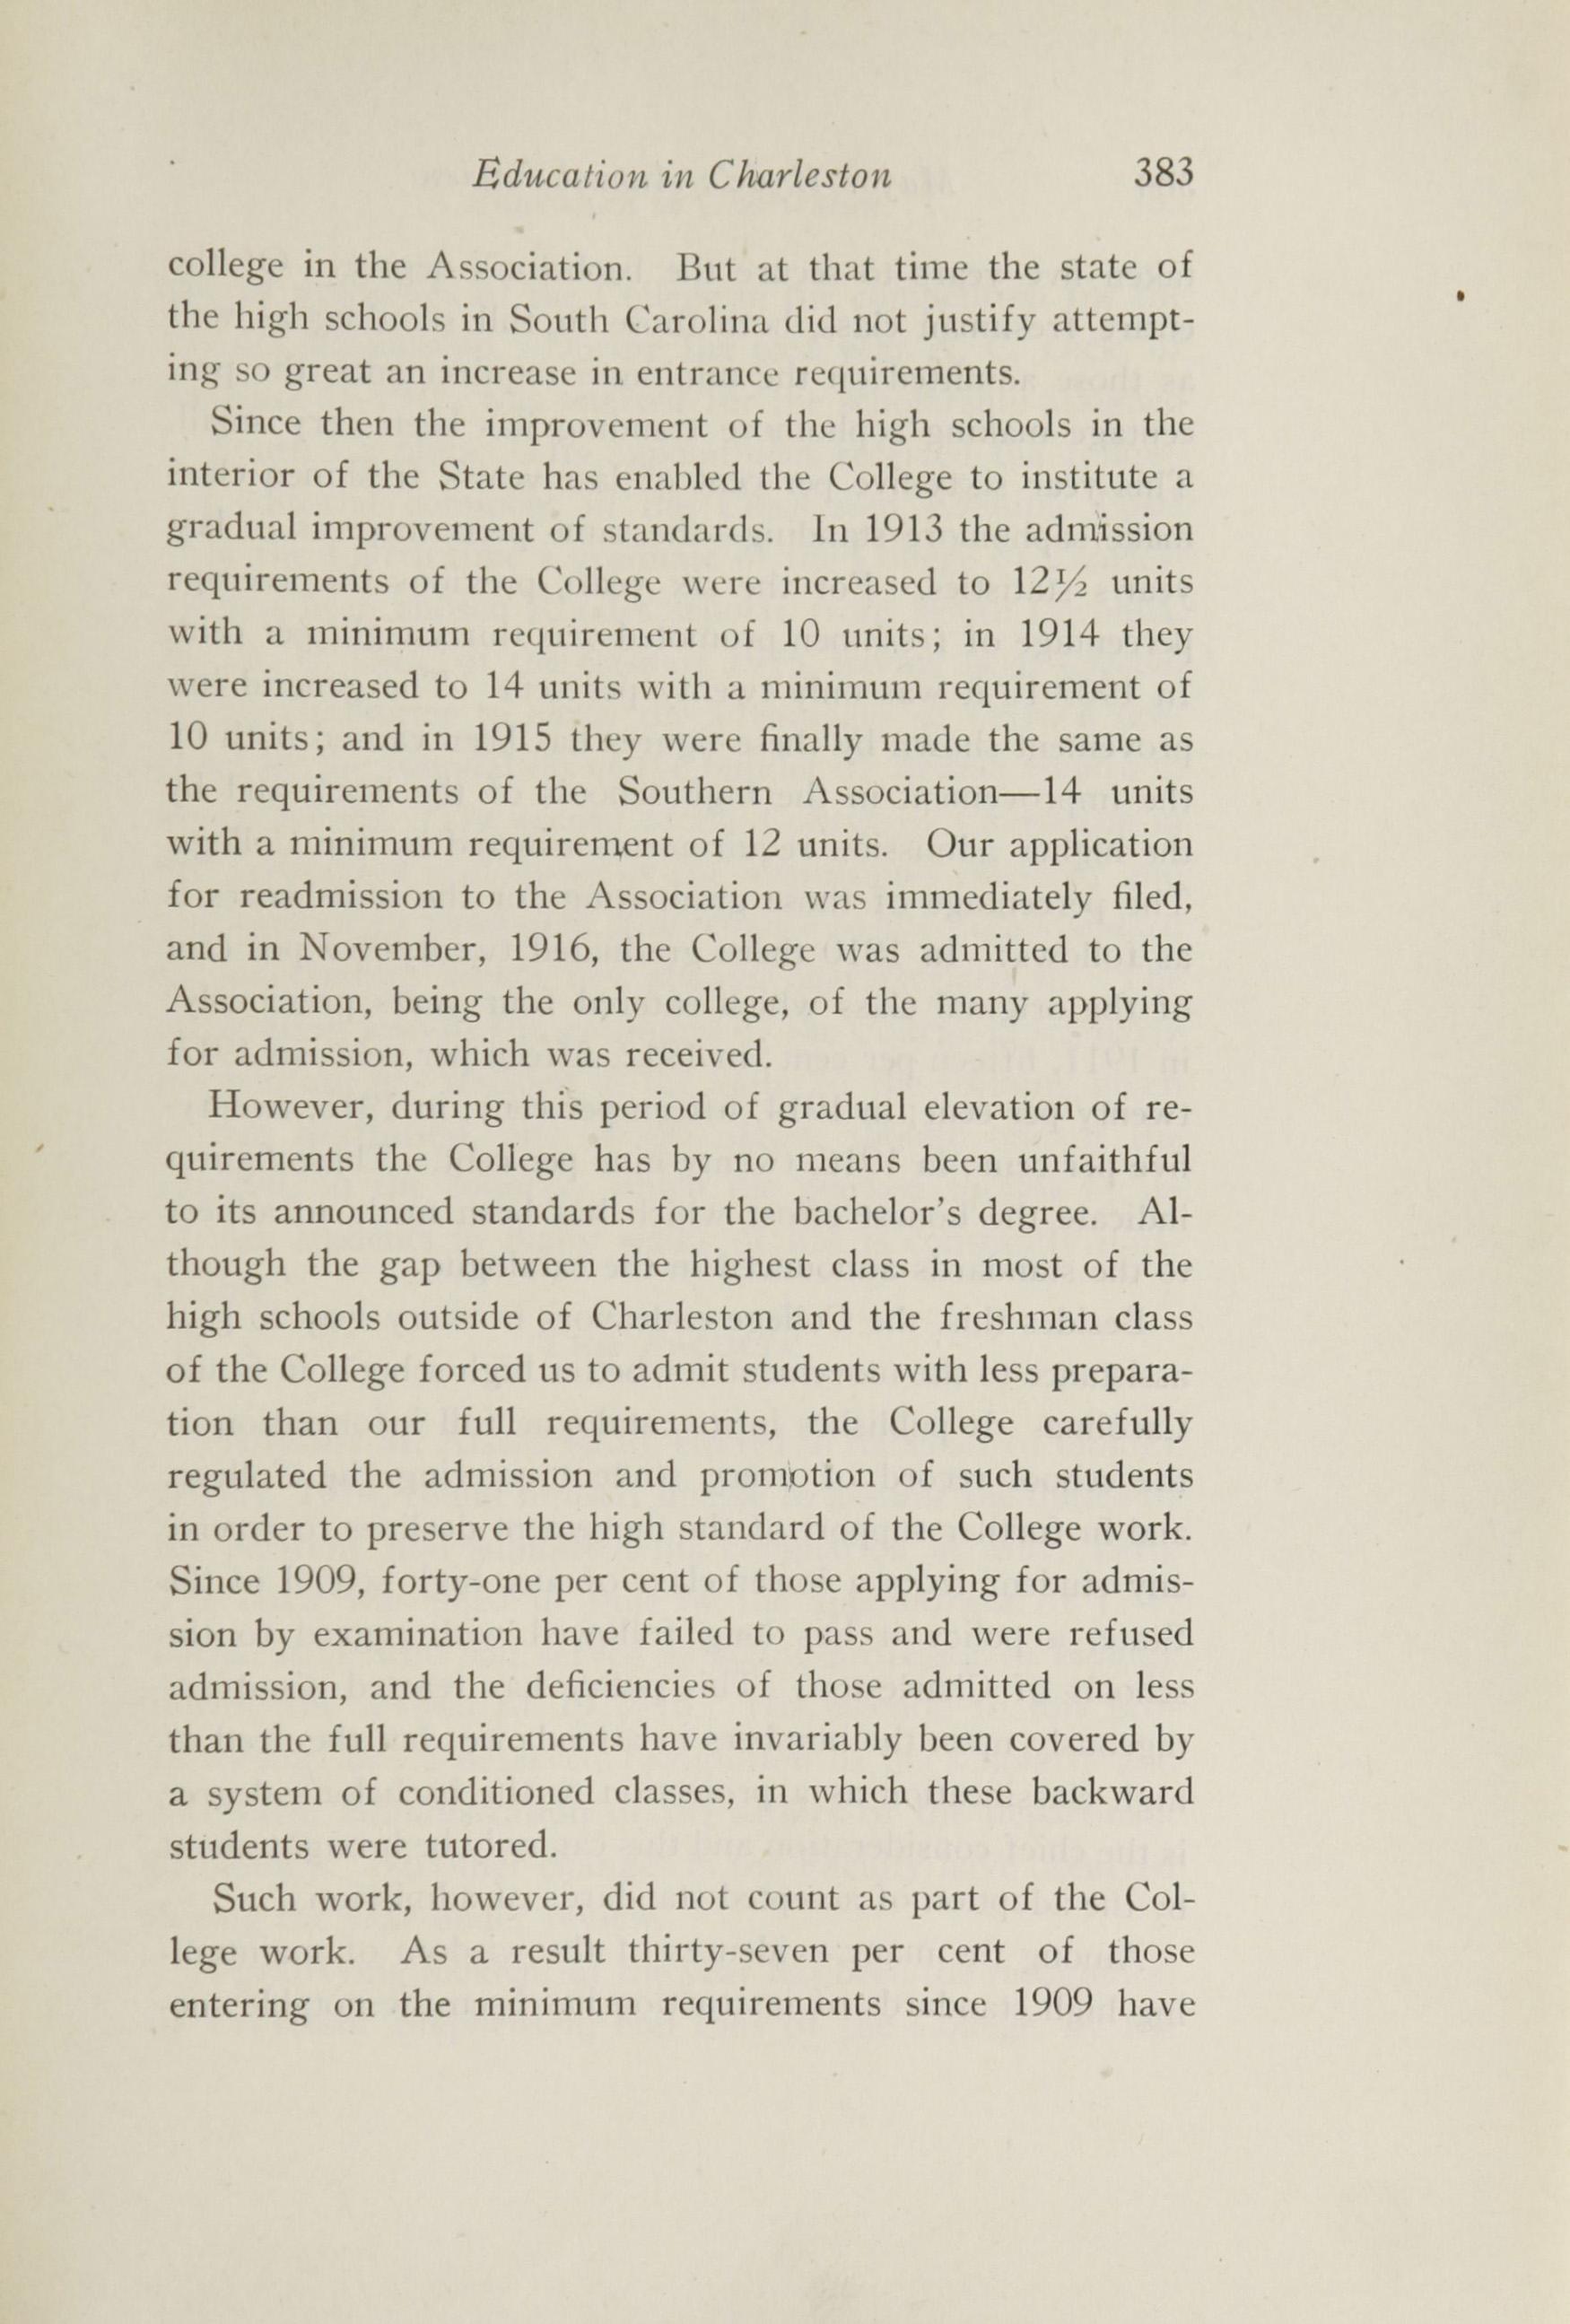 Charleston Yearbook, 1916, page 383